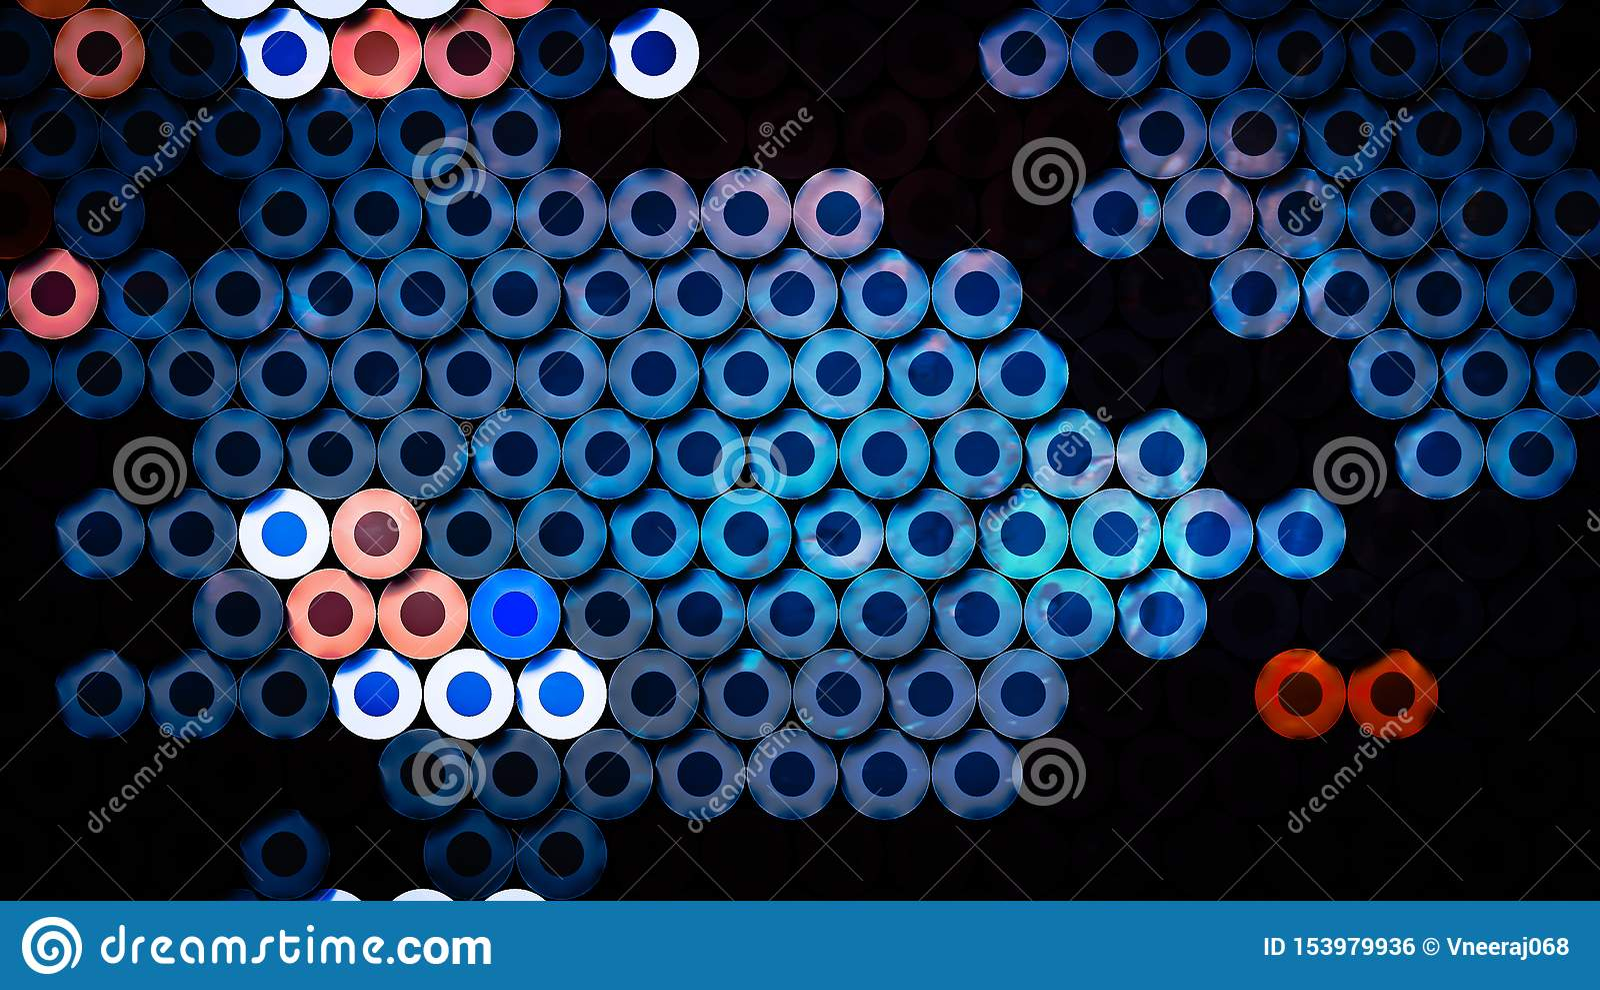 galaxy blue shades tube wallpaper tubes cut slide colour appearing deep universe 153979936